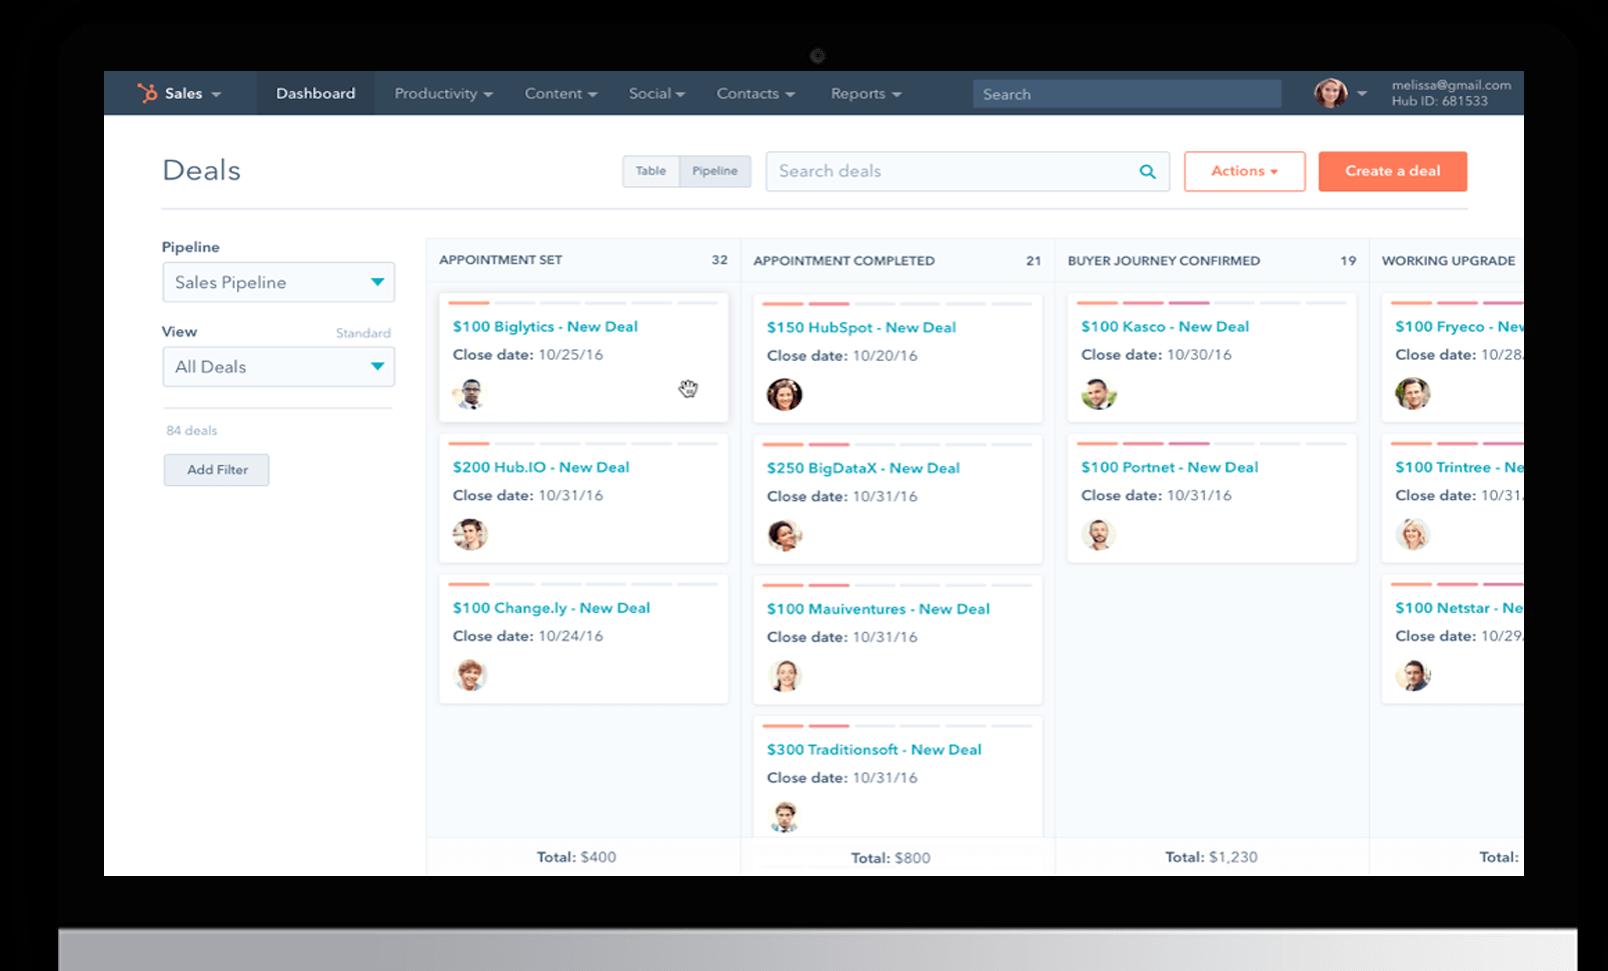 HubSpot CRM Deal Dashboard, HubSpot CRM Dashboard | Alycom Business Solutions